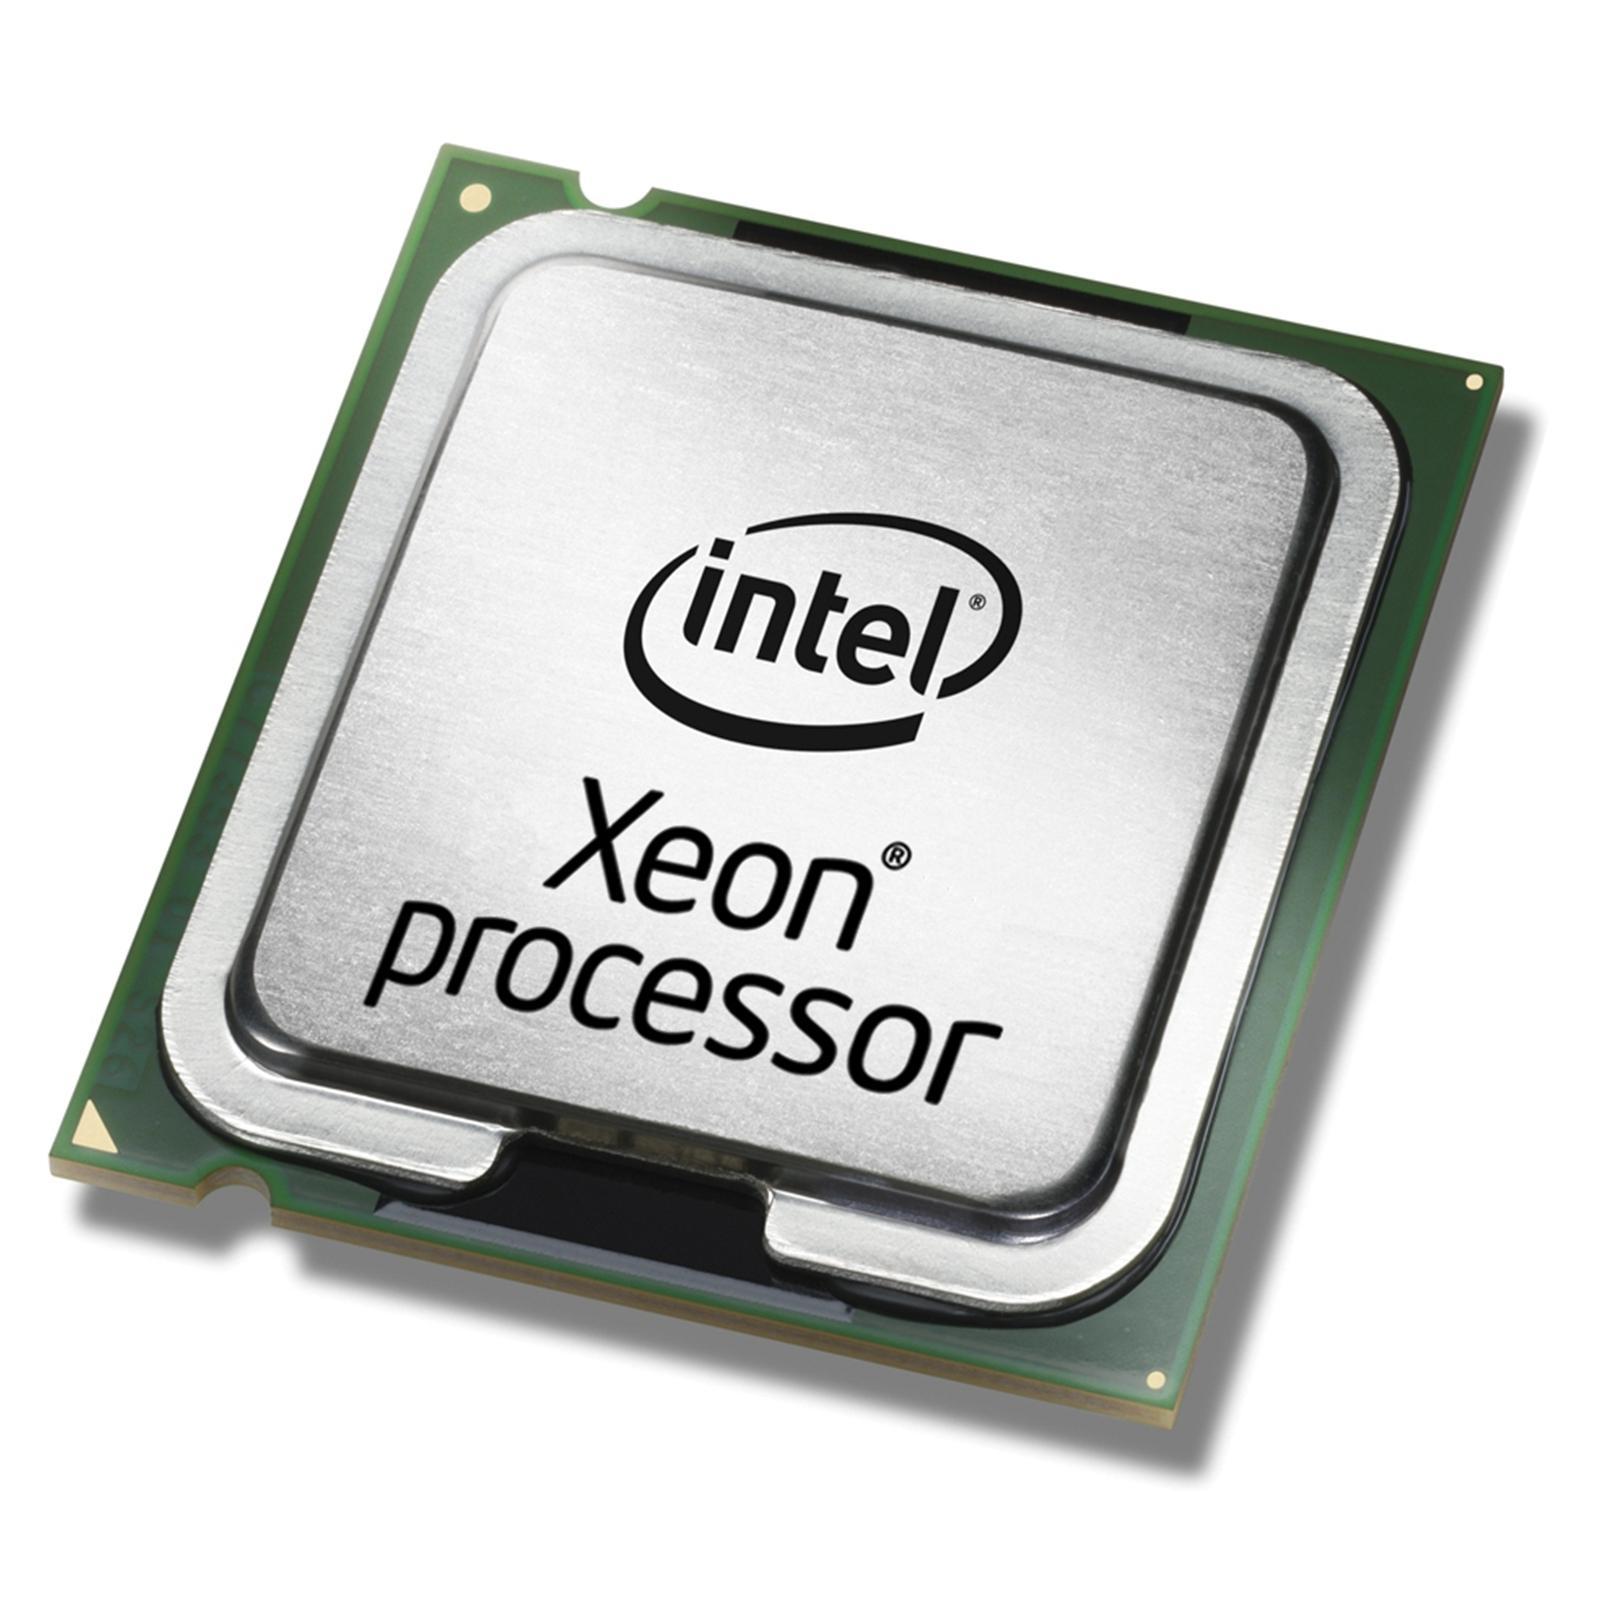 Express Intel Xeon Proc E5-2650 v2 8C 2.6GHz 20MB Cache 1866MHz 95W